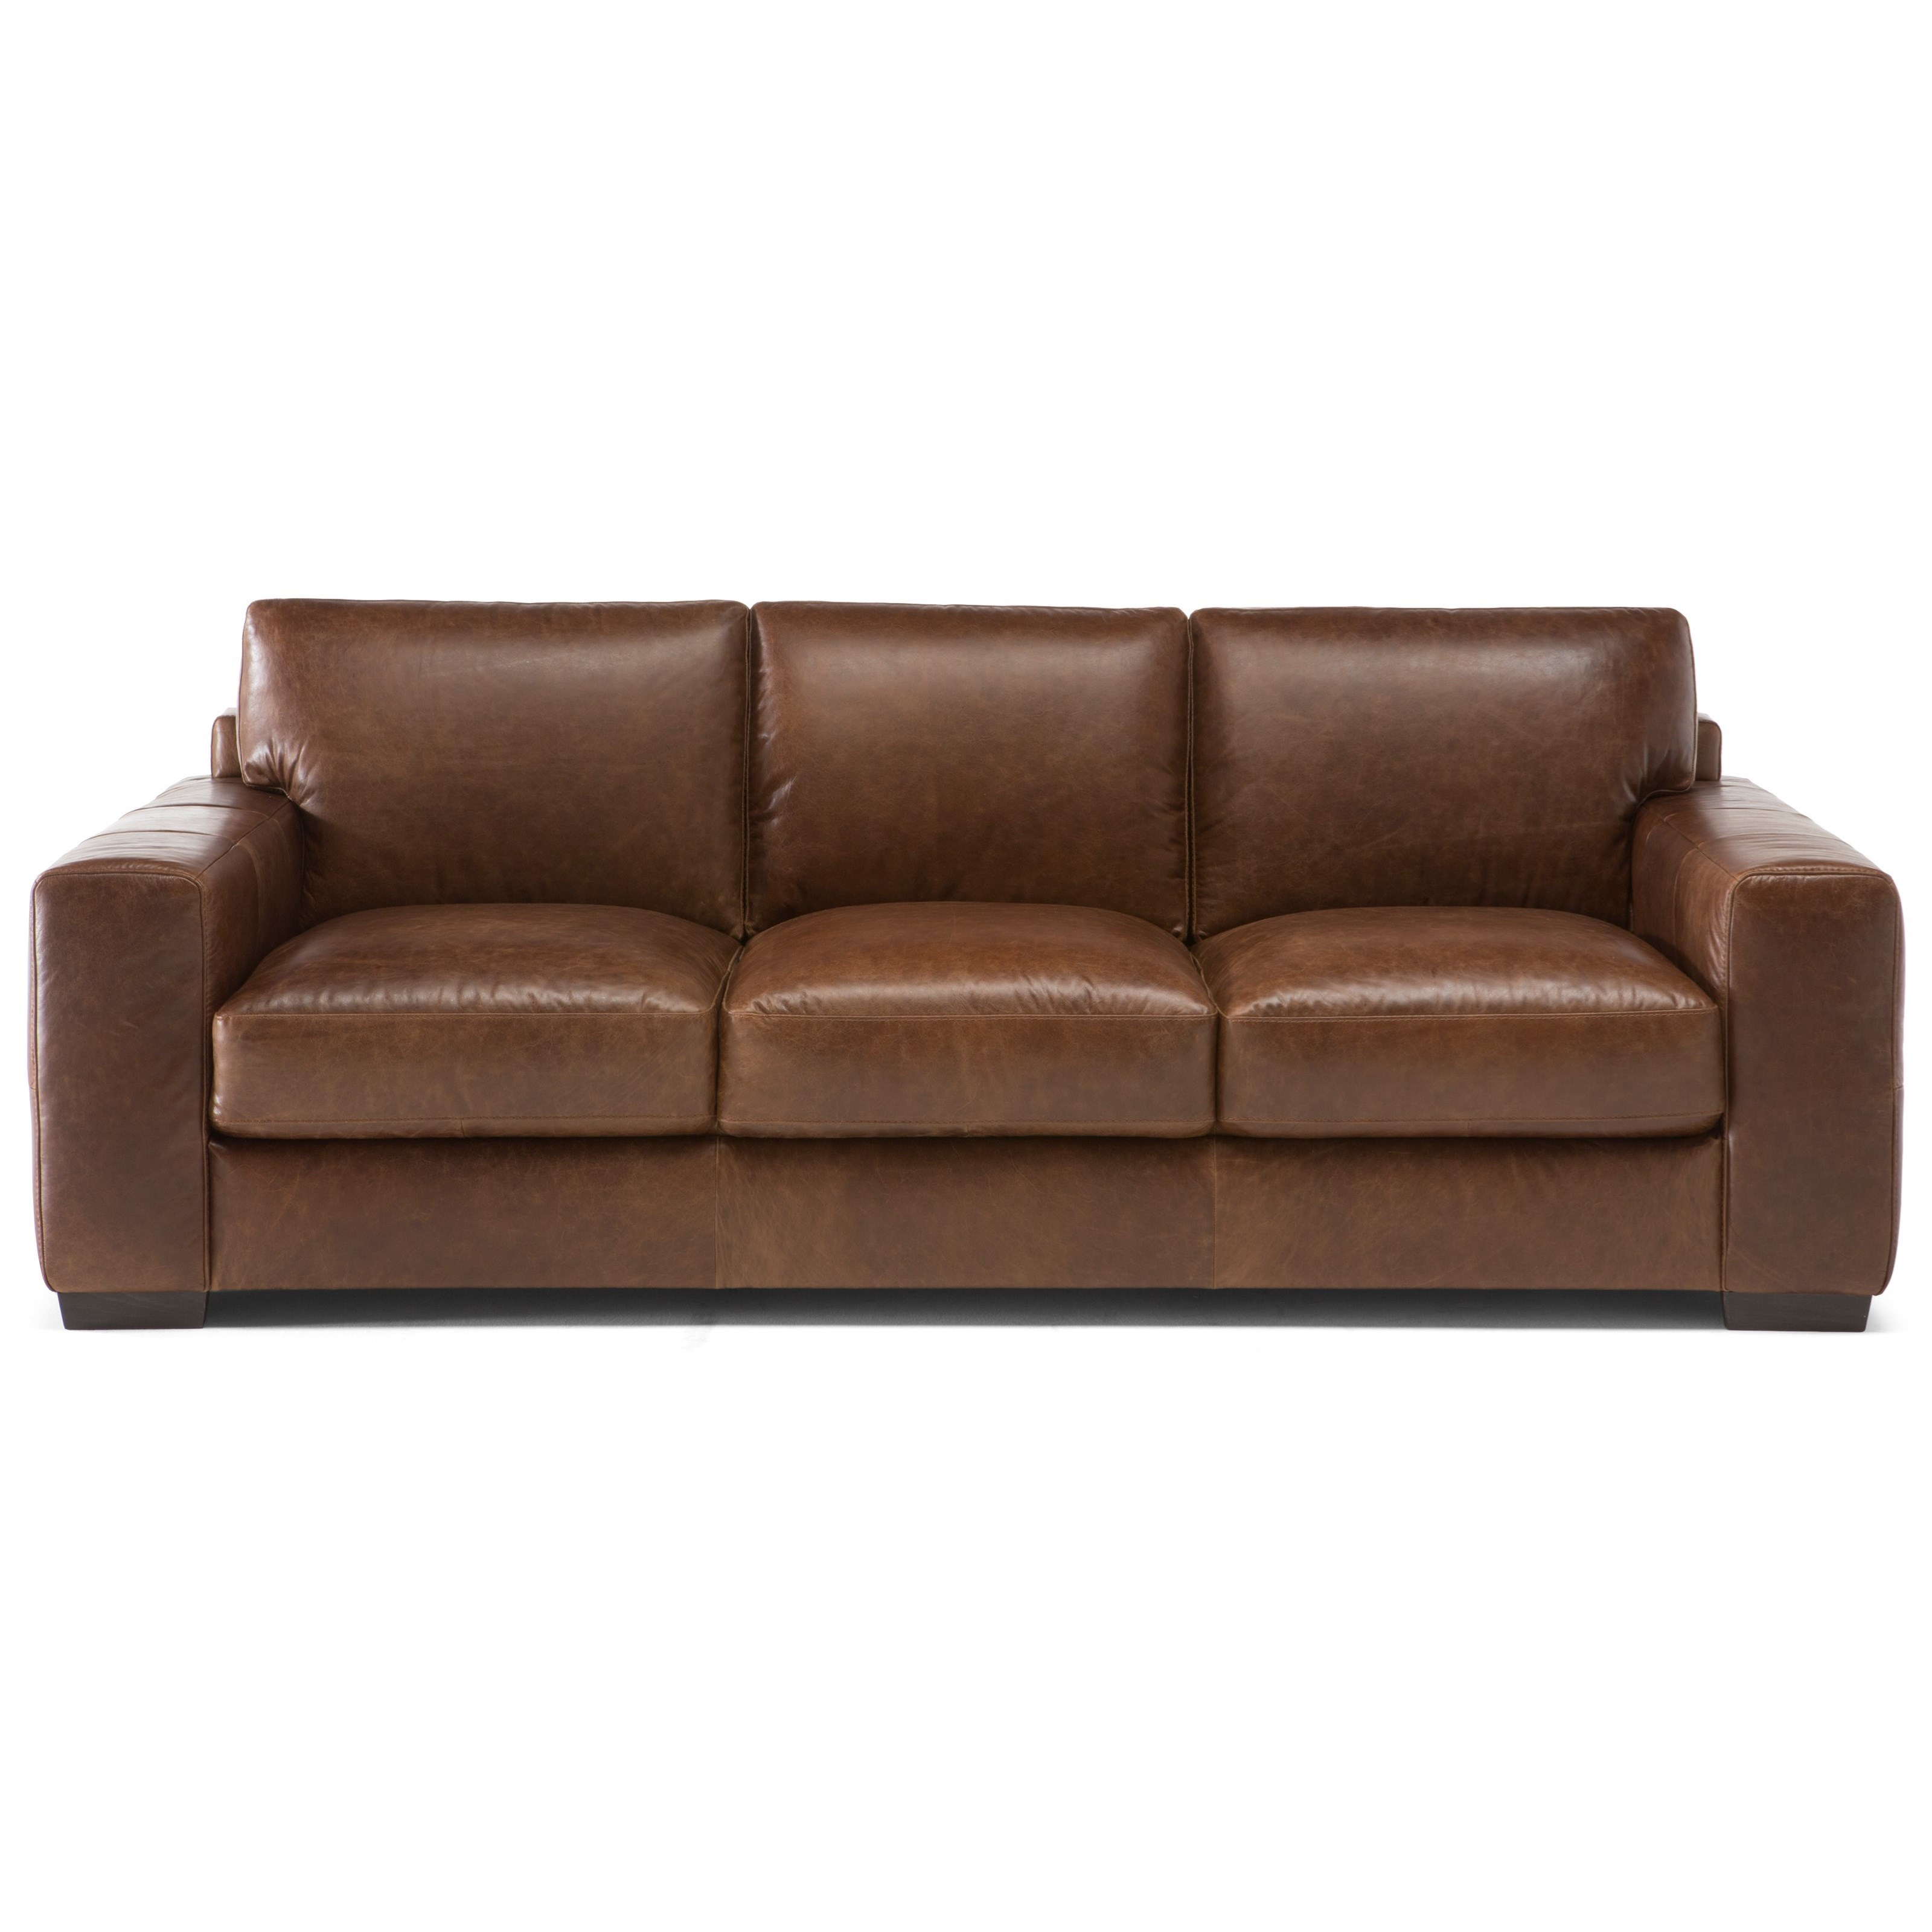 Integro Sofa by Natuzzi Editions at HomeWorld Furniture